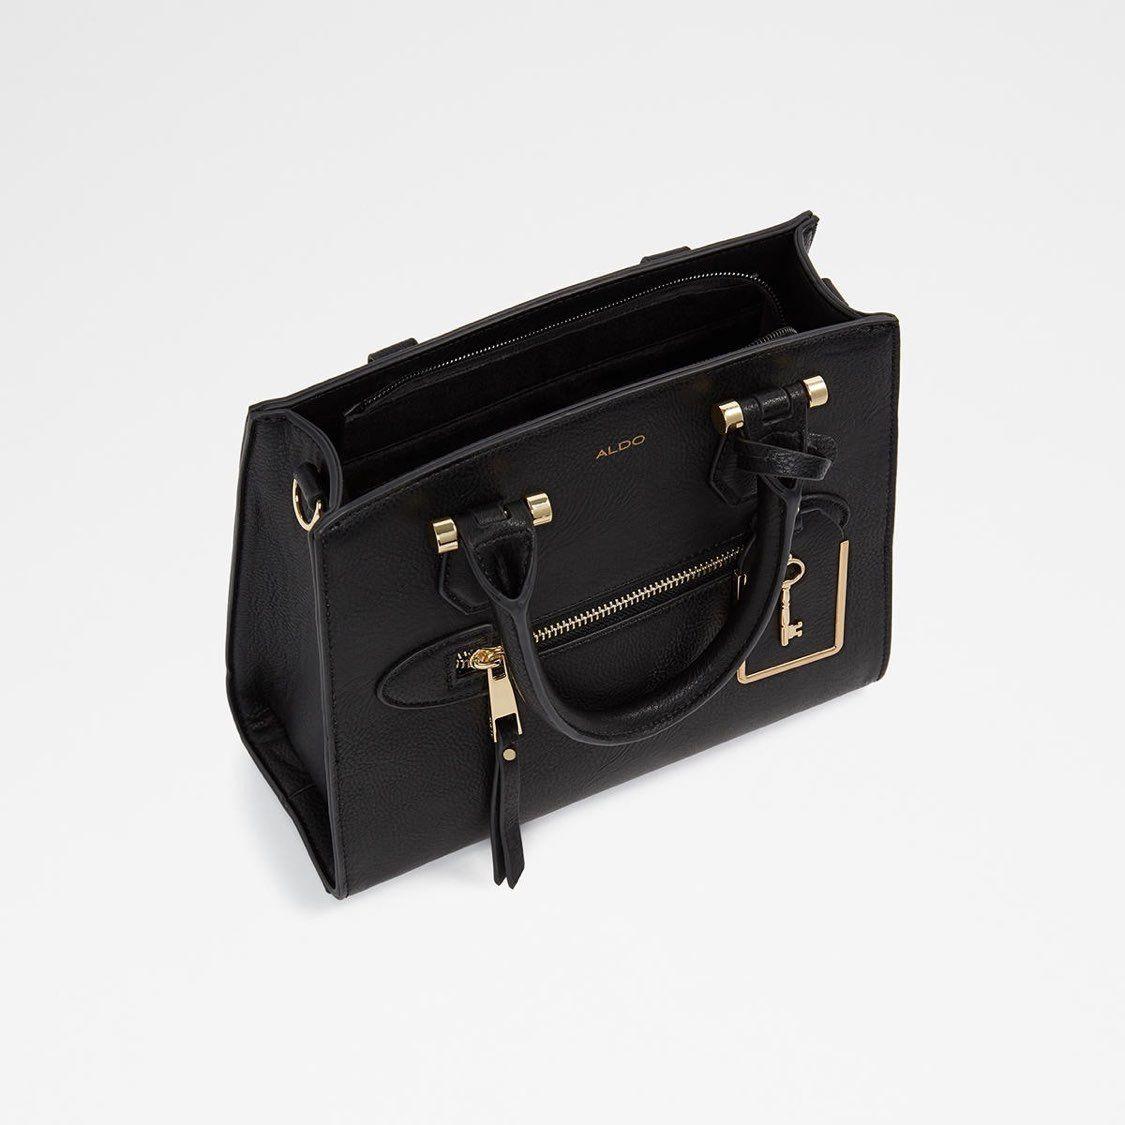 Aldo Repen Black | Top handbags, Bags, Stuff to buy